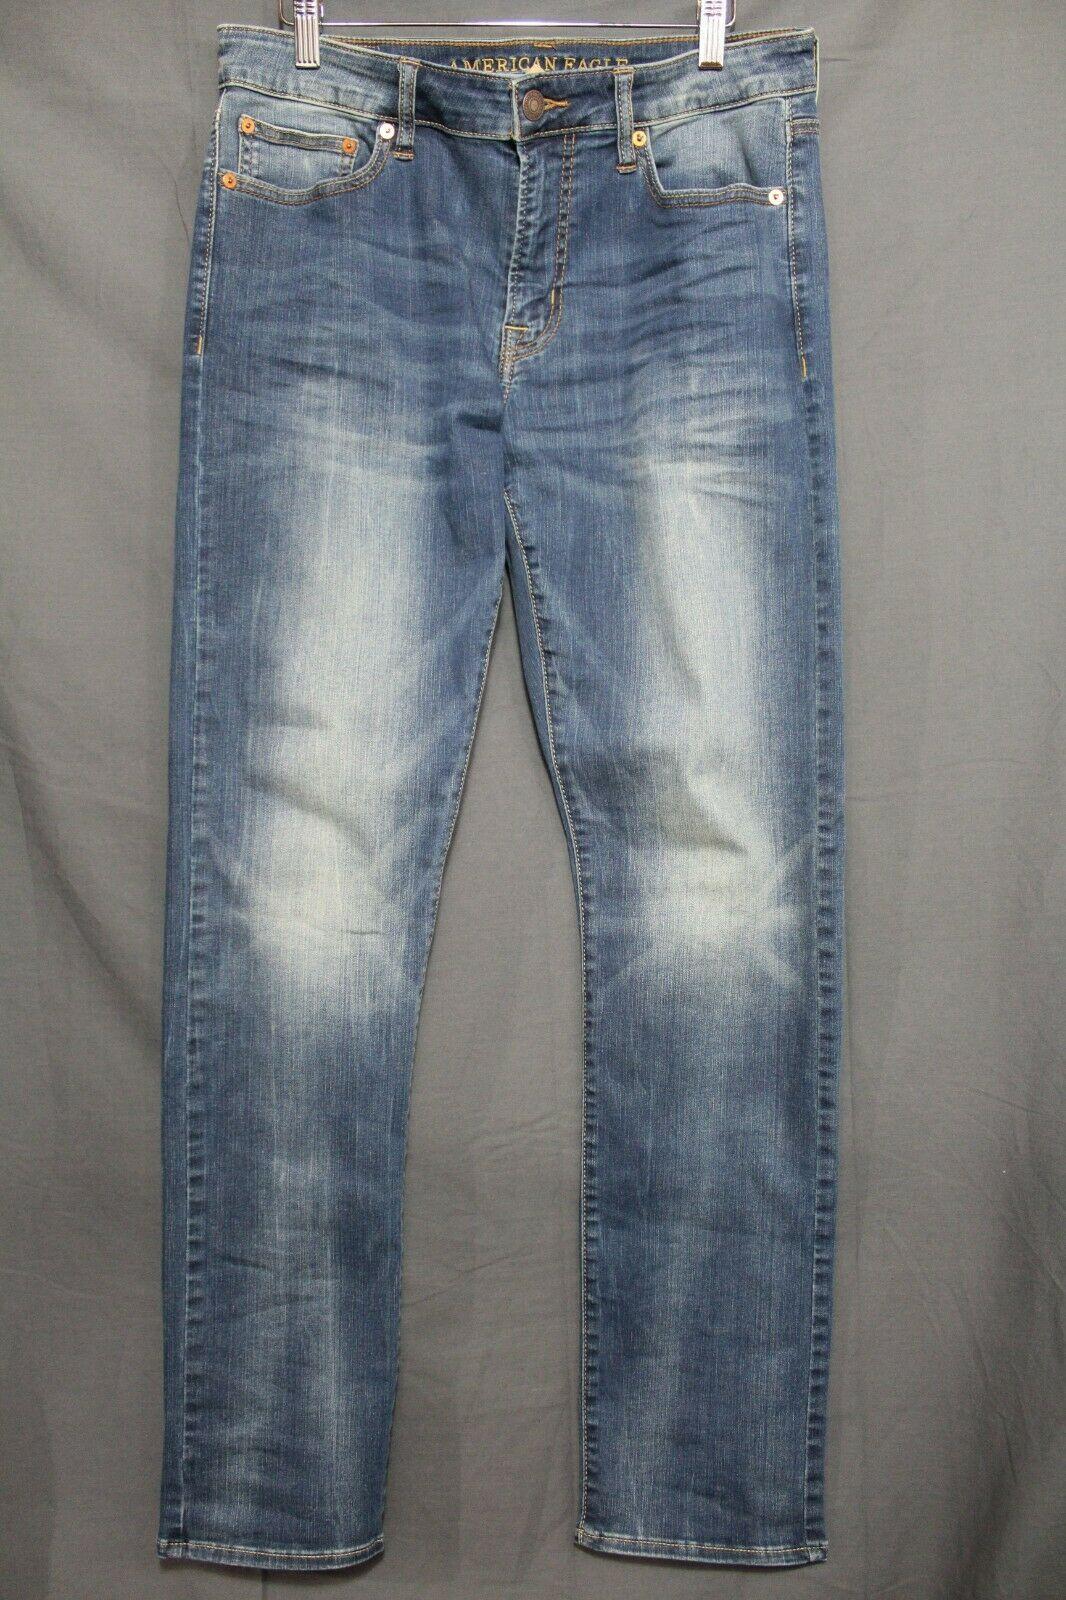 NEW Men's AE Slim Jeans Extreme Flex Faded Medium Blue Wash AEO 32 x  32